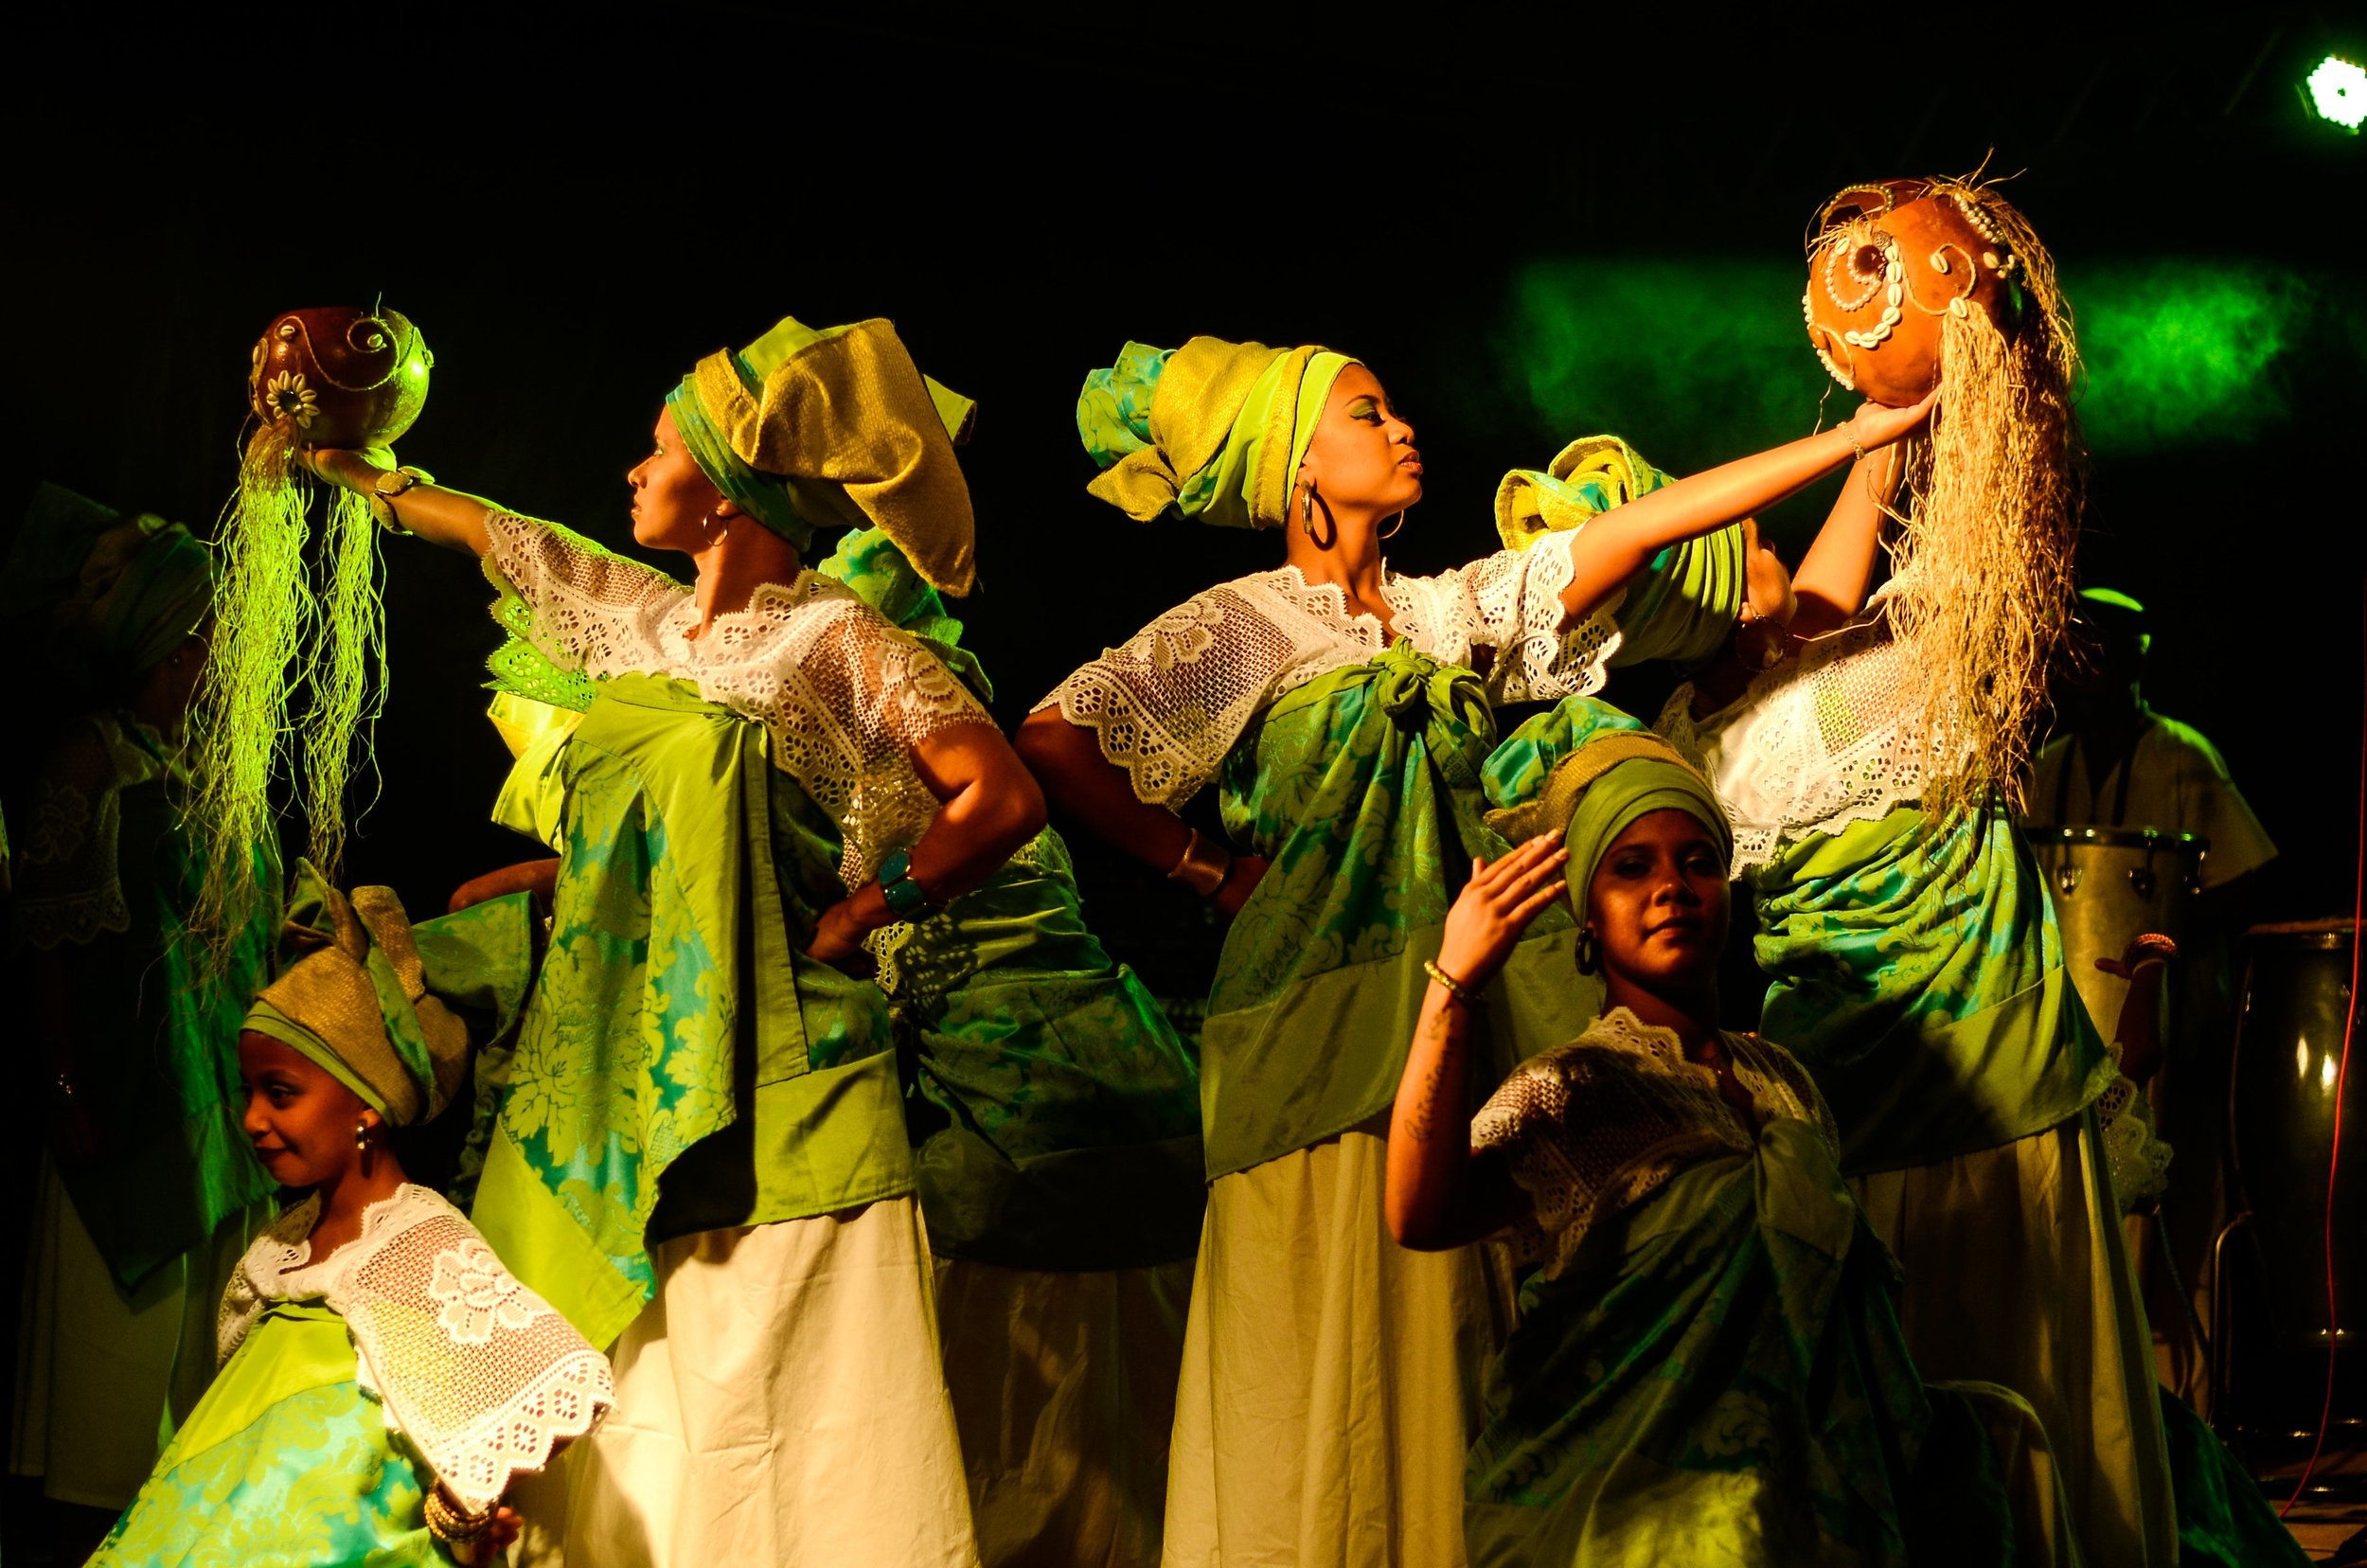 costumes-dance-dancers-1405814.jpg